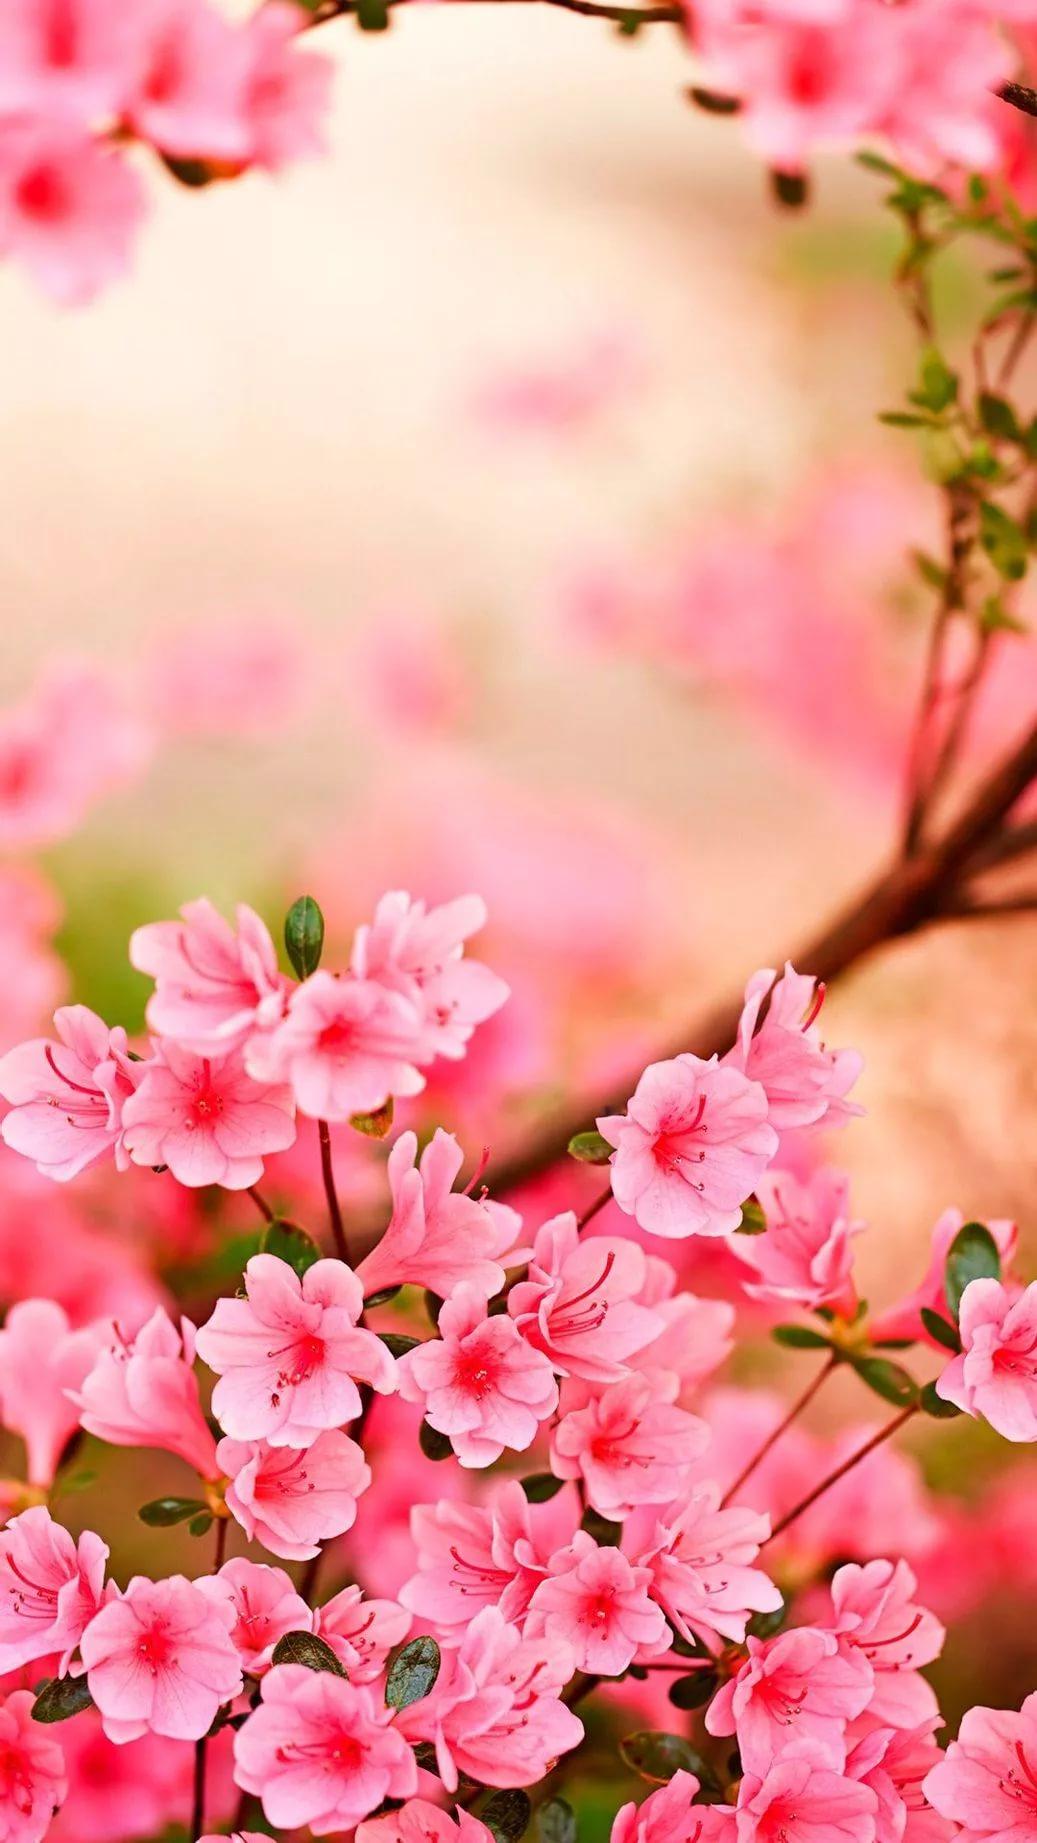 Красивые hd обои весна на телефон 8